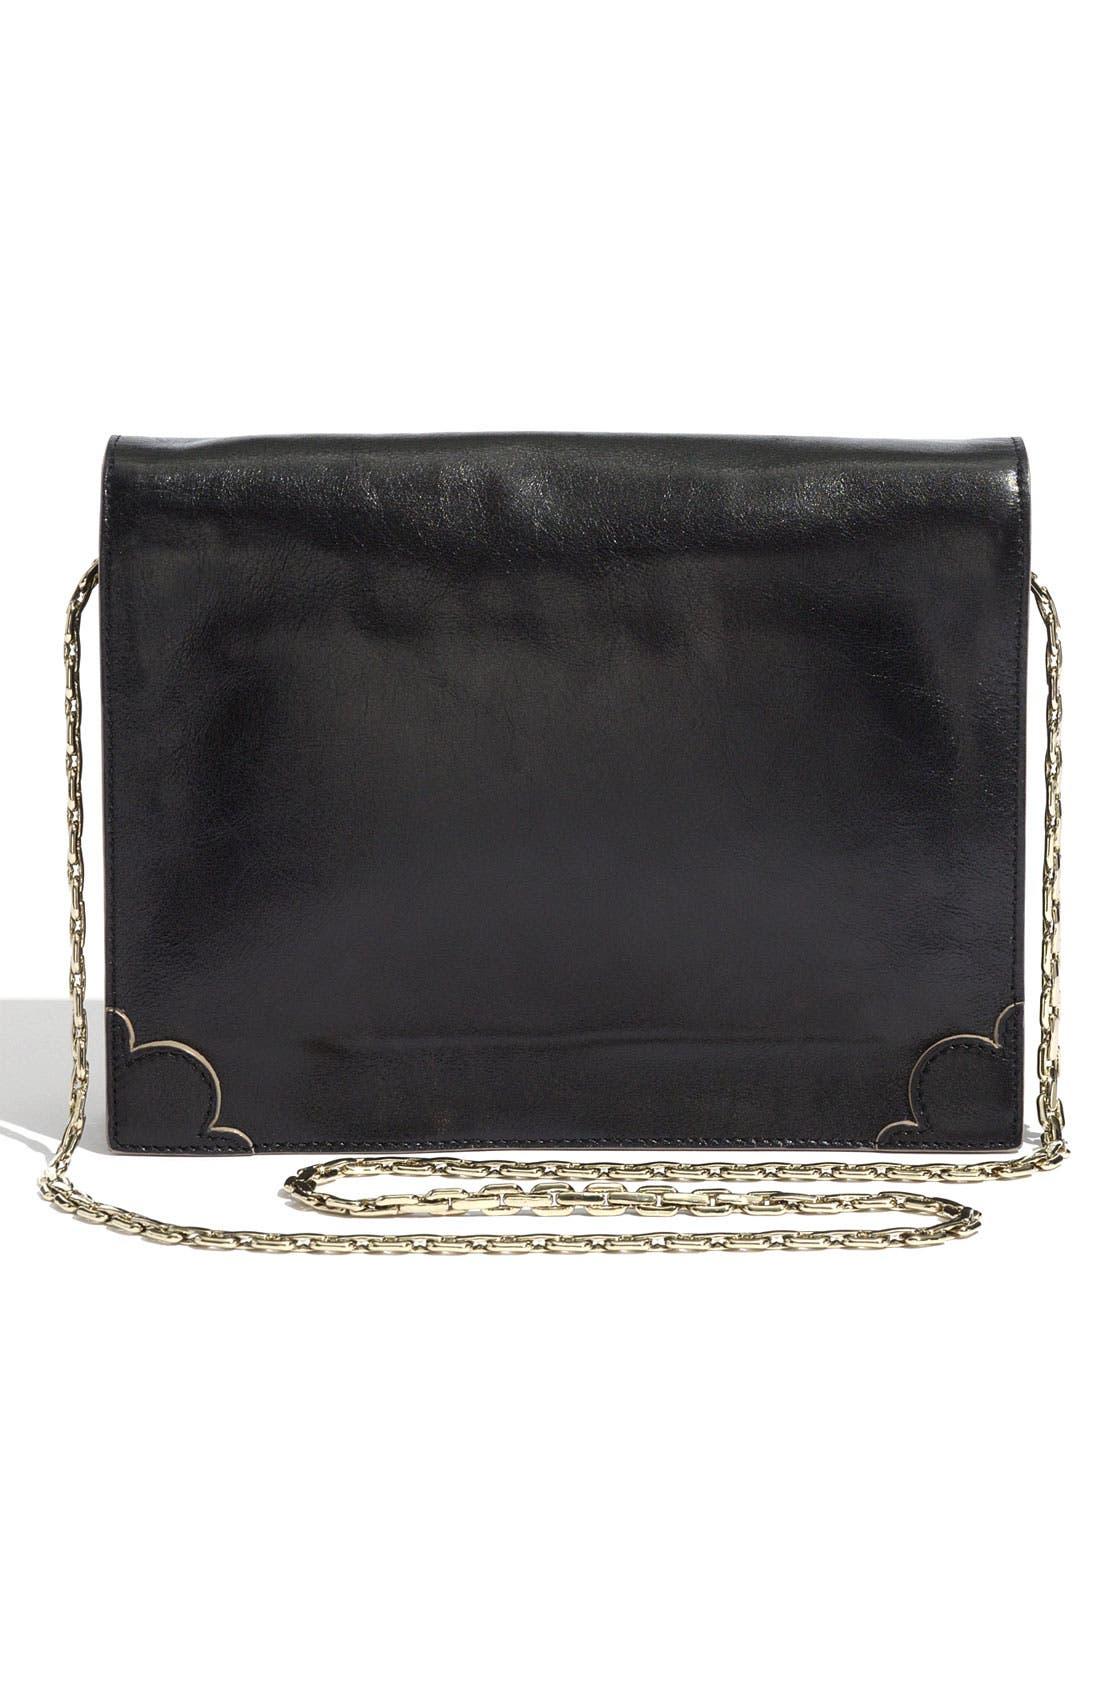 ,                             Jason Wu 'Jourdan' Calfskin Leather Shoulder Bag,                             Alternate thumbnail 3, color,                             001